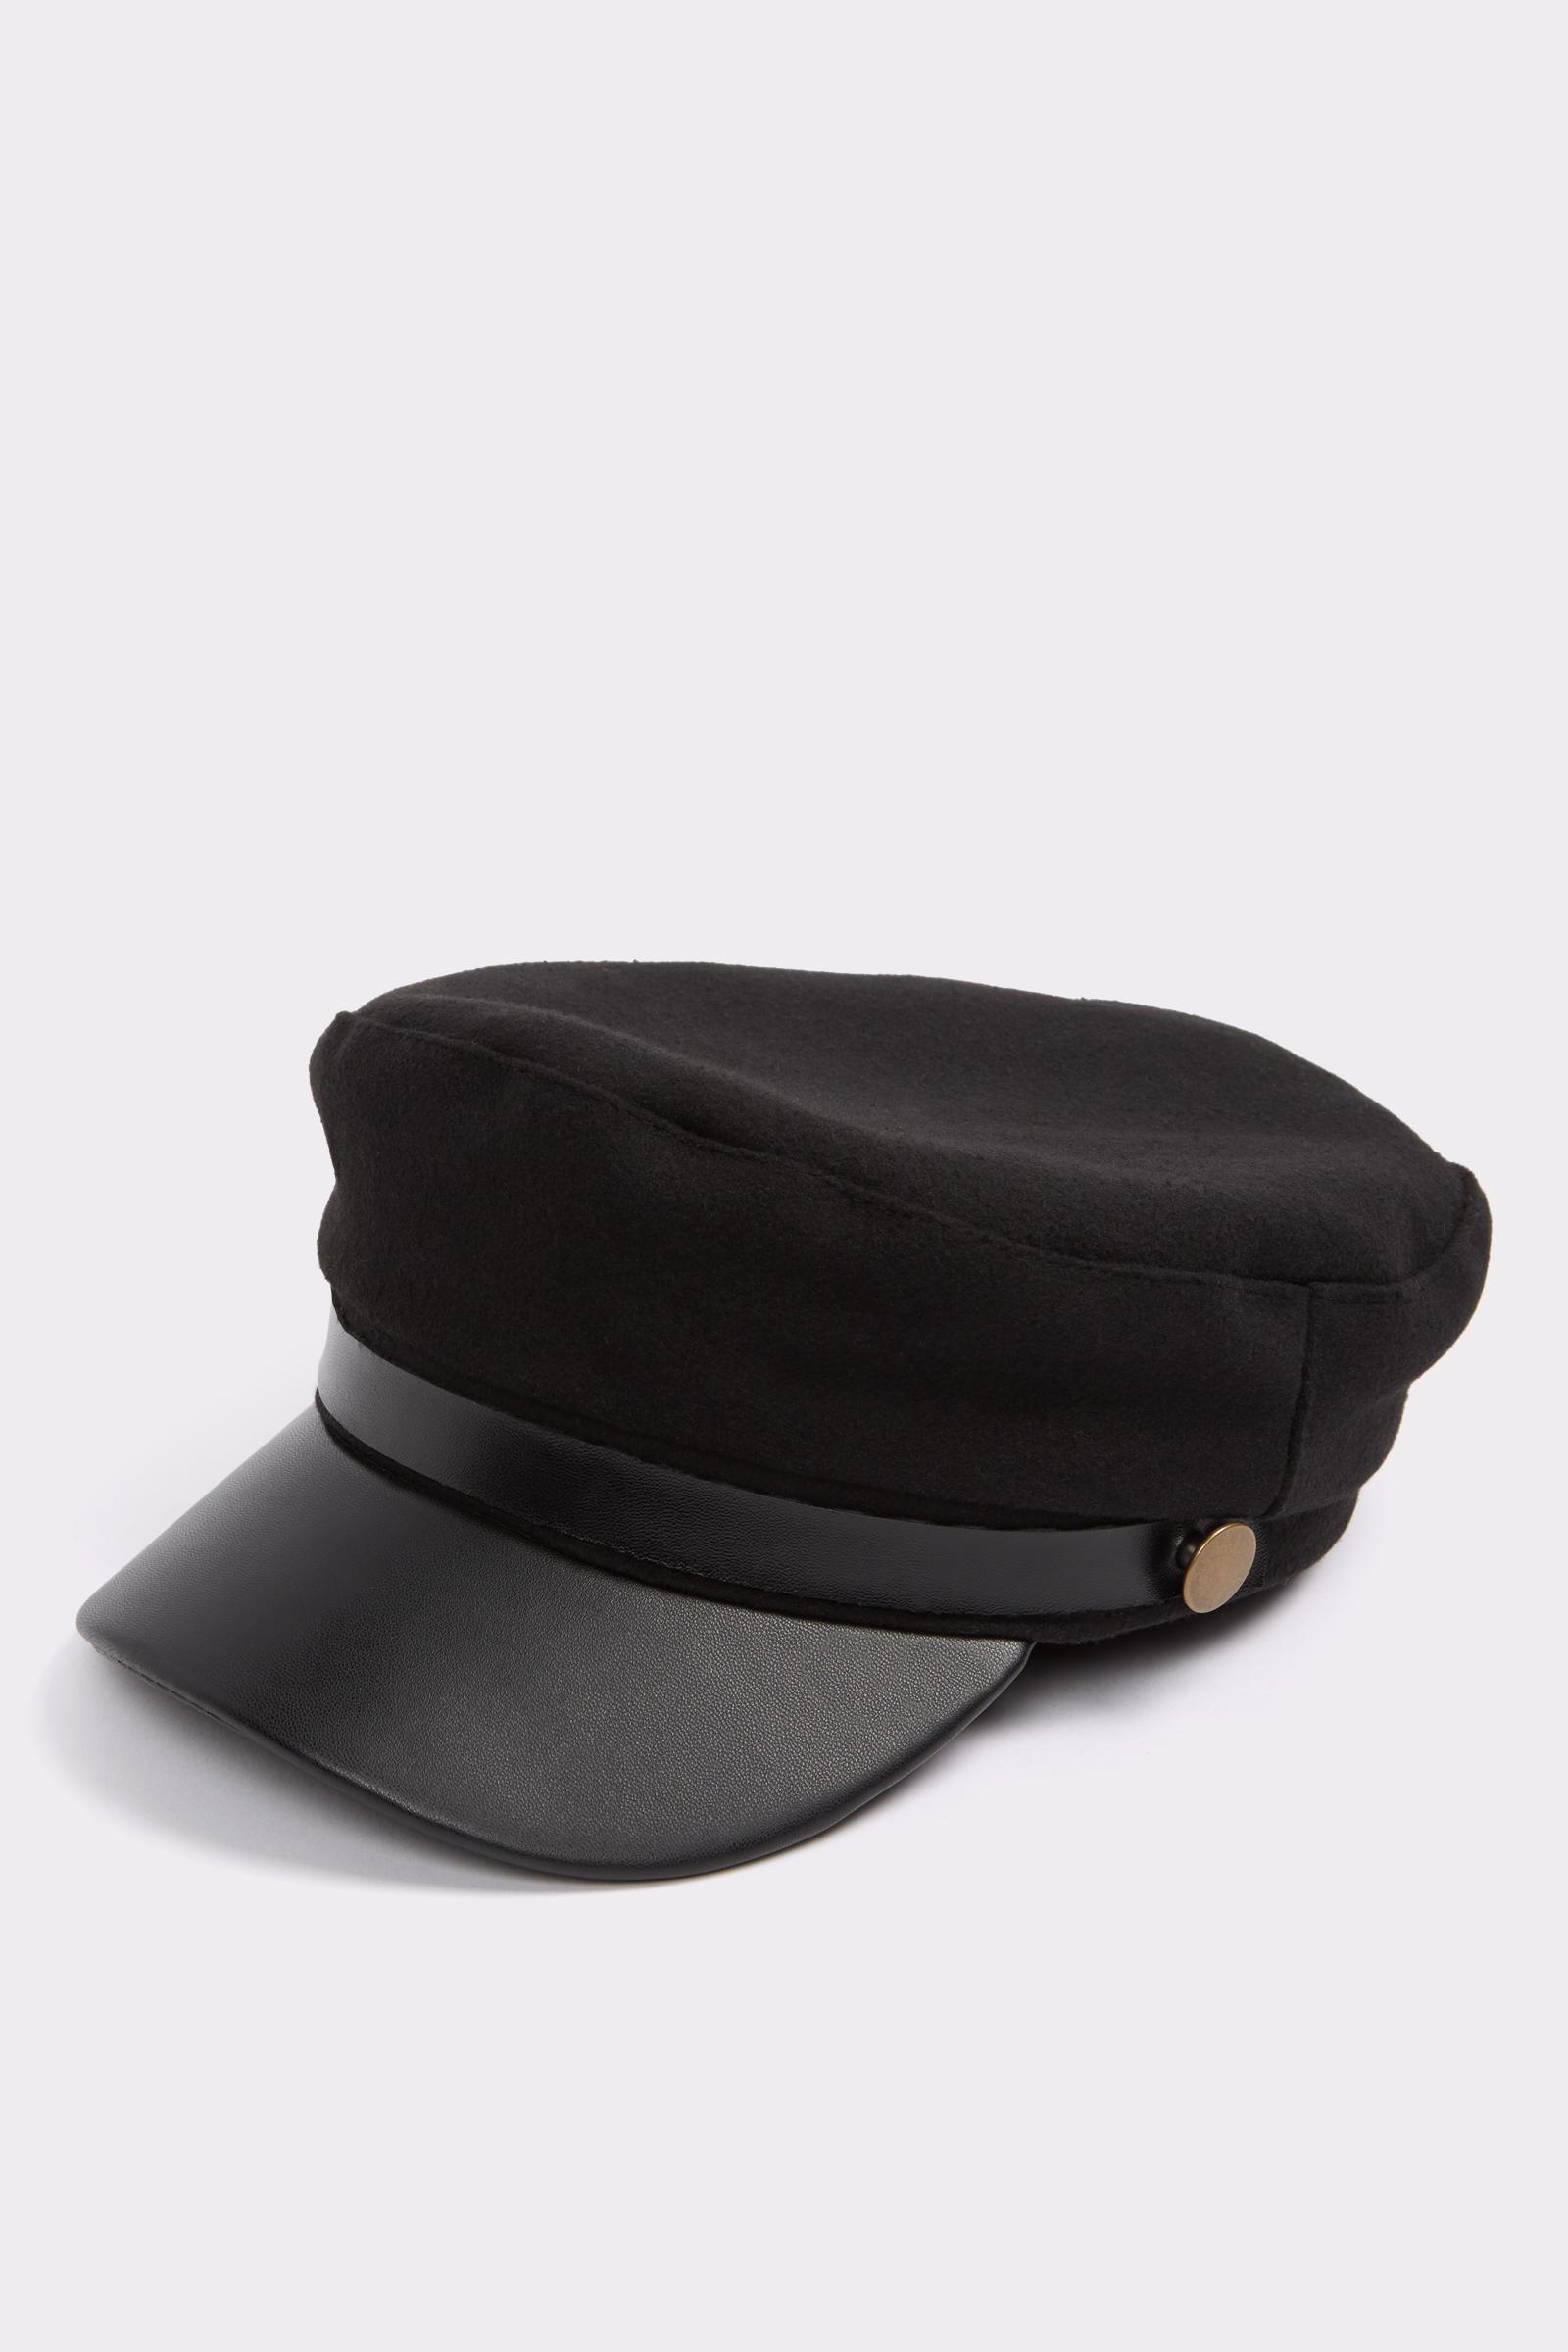 Black Driver Cap, $20, Aldo